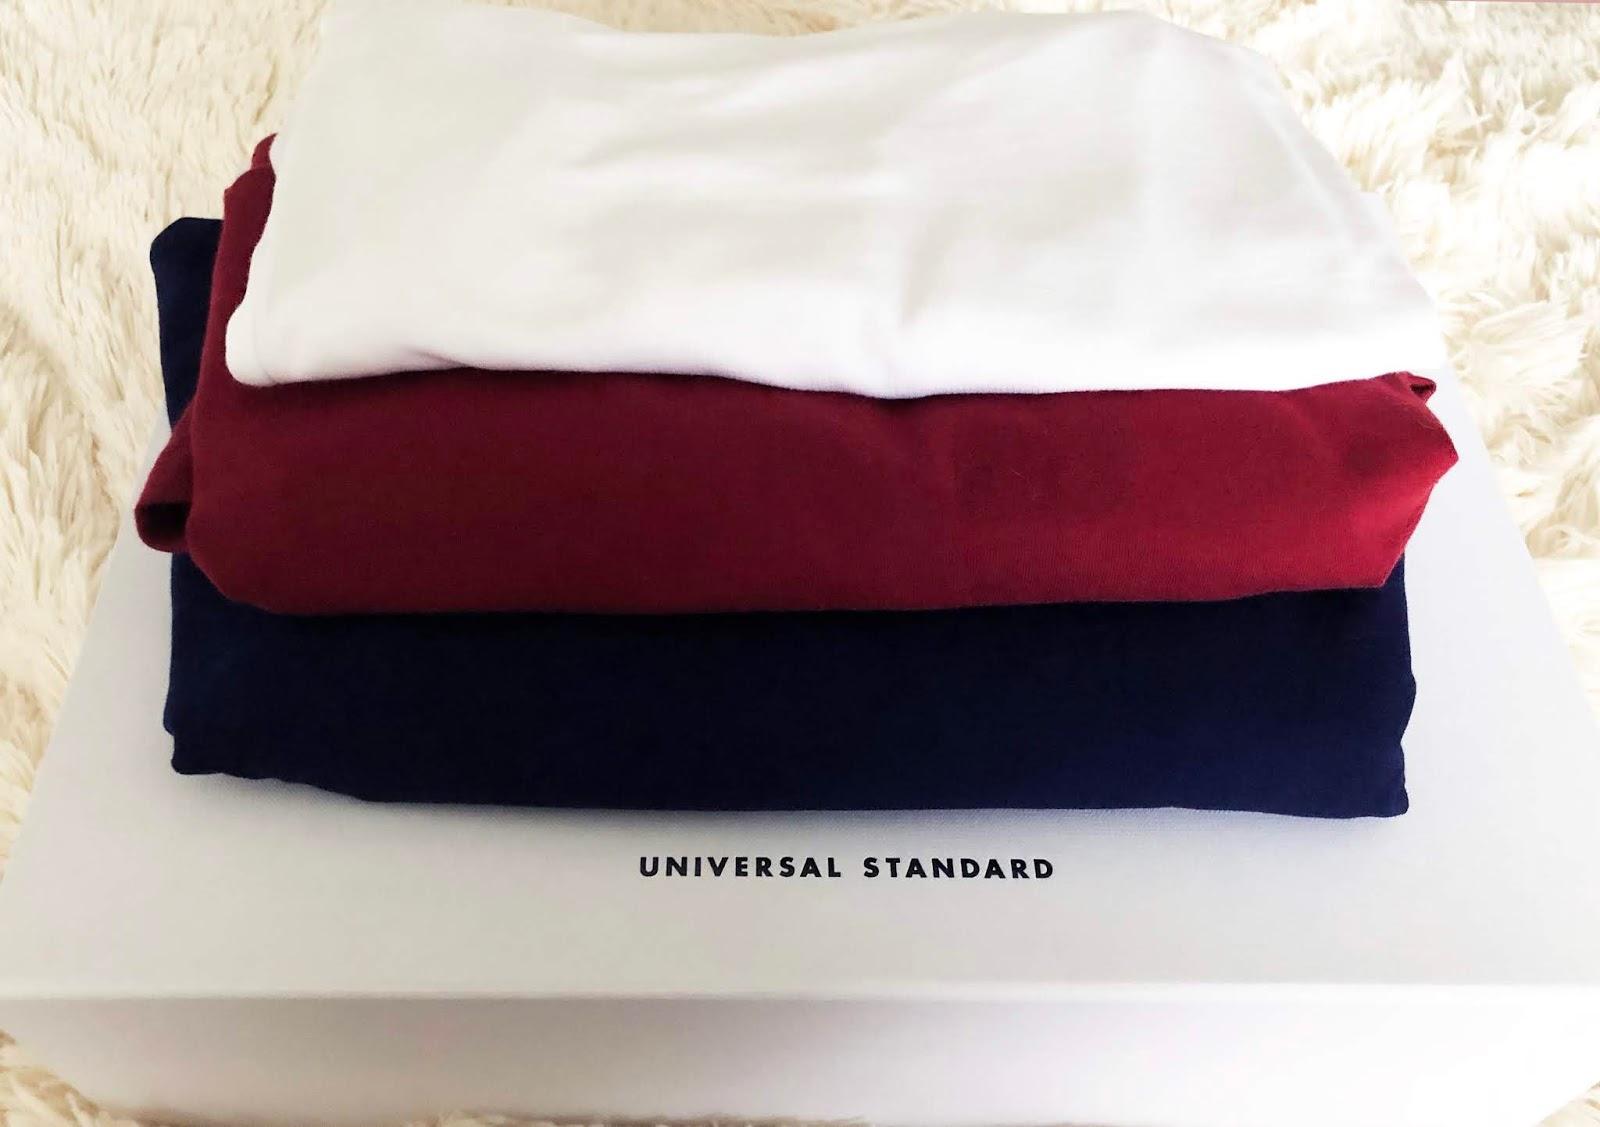 Universal Standard Dresses Mystery Box